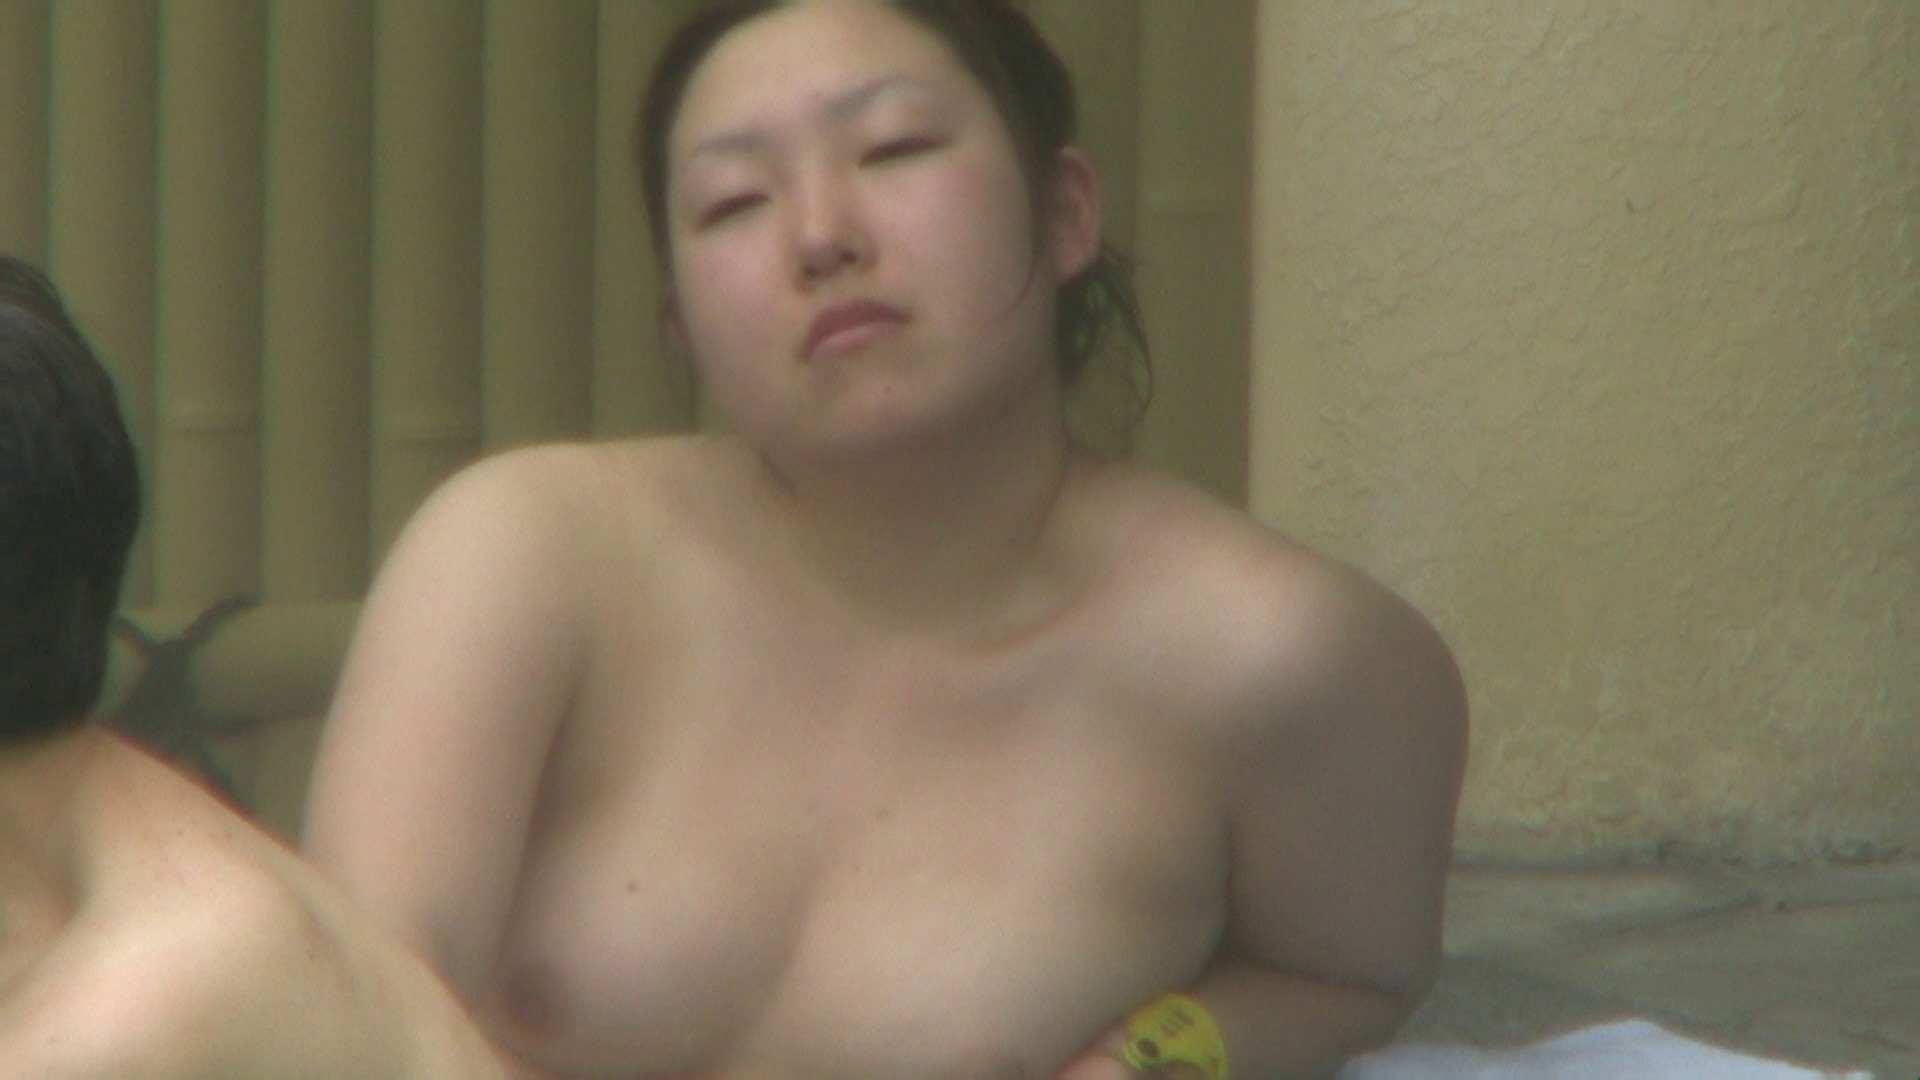 Aquaな露天風呂Vol.72【VIP限定】 露天風呂編 | 盗撮シリーズ  98PIX 49